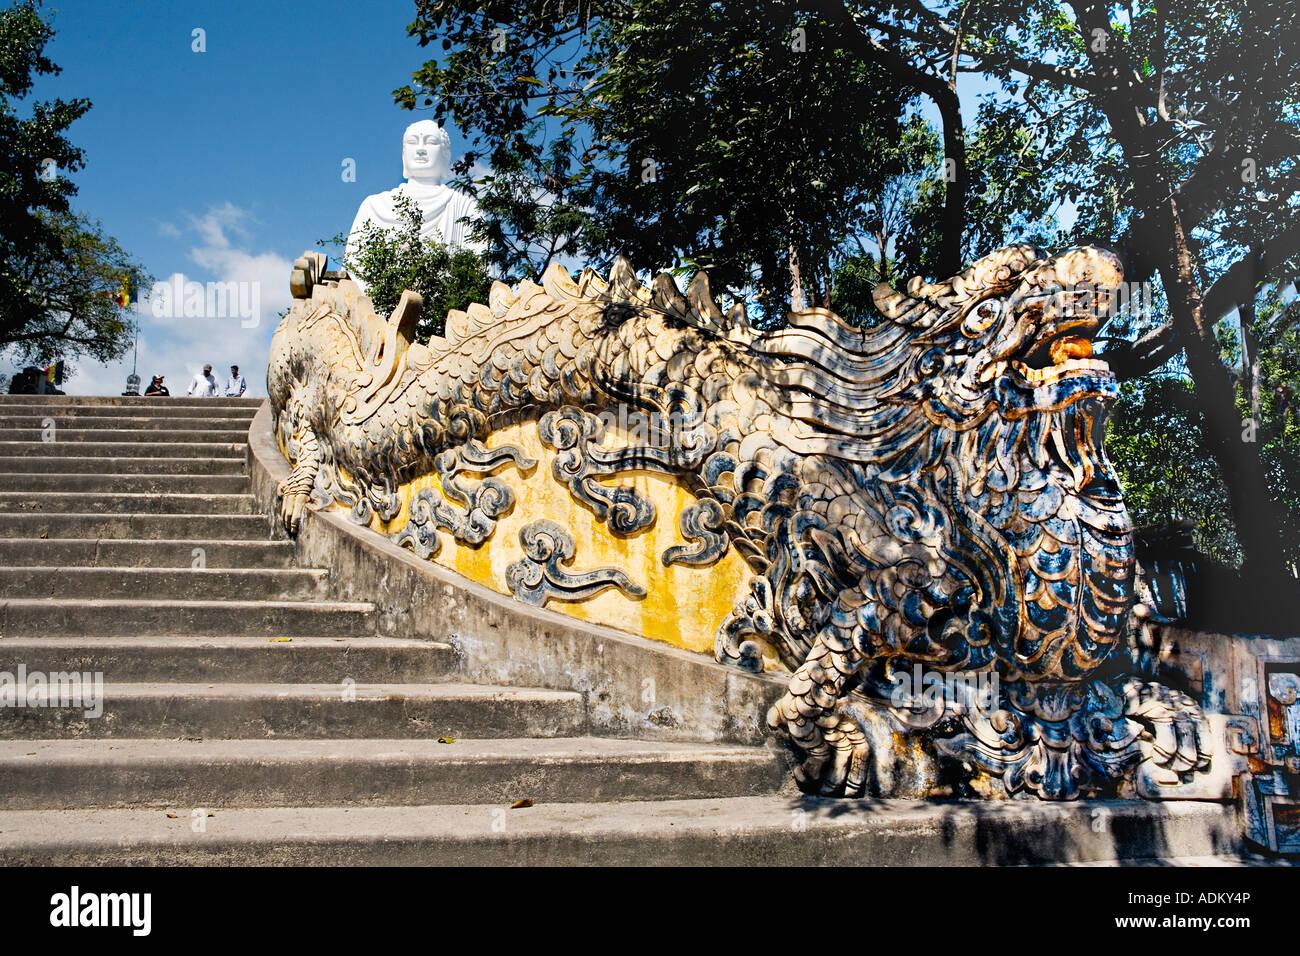 "Dragon stairway leading up to the large white statue of the seated [Sakyamuni Buddha], ""Long Son Pagoda"", ""NhaTrang"", Stock Photo"